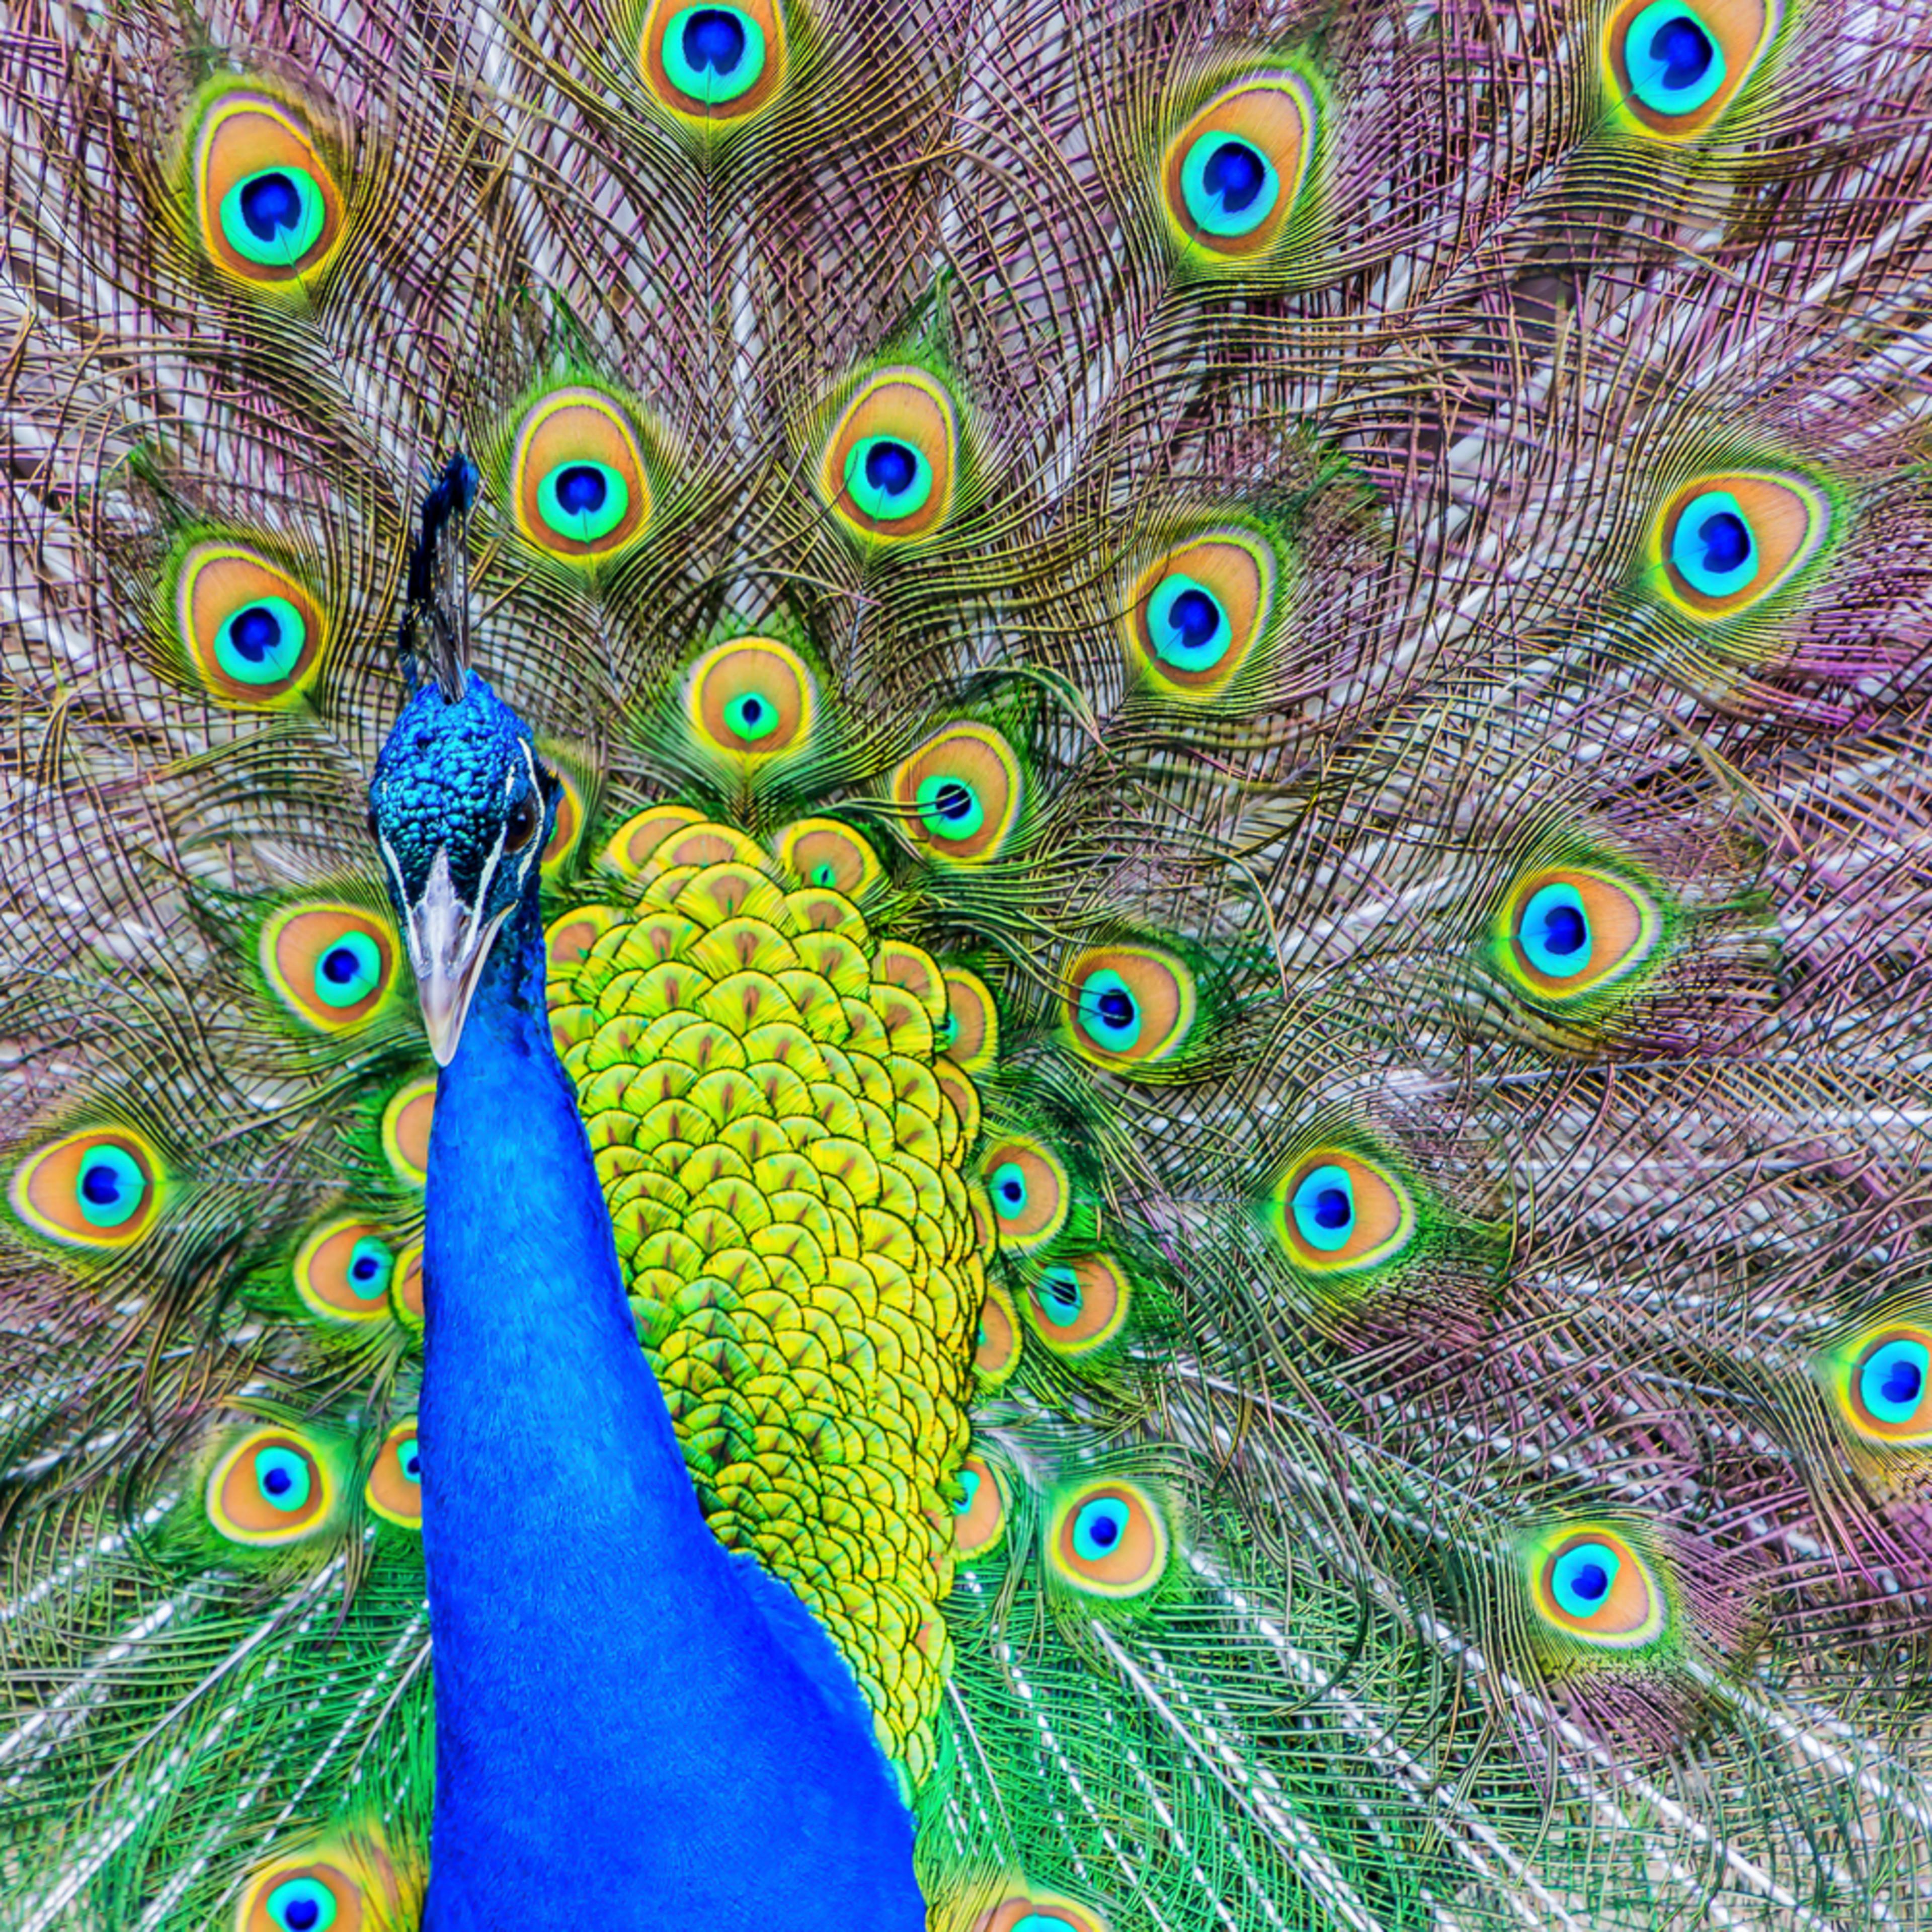 Peacock chka4r